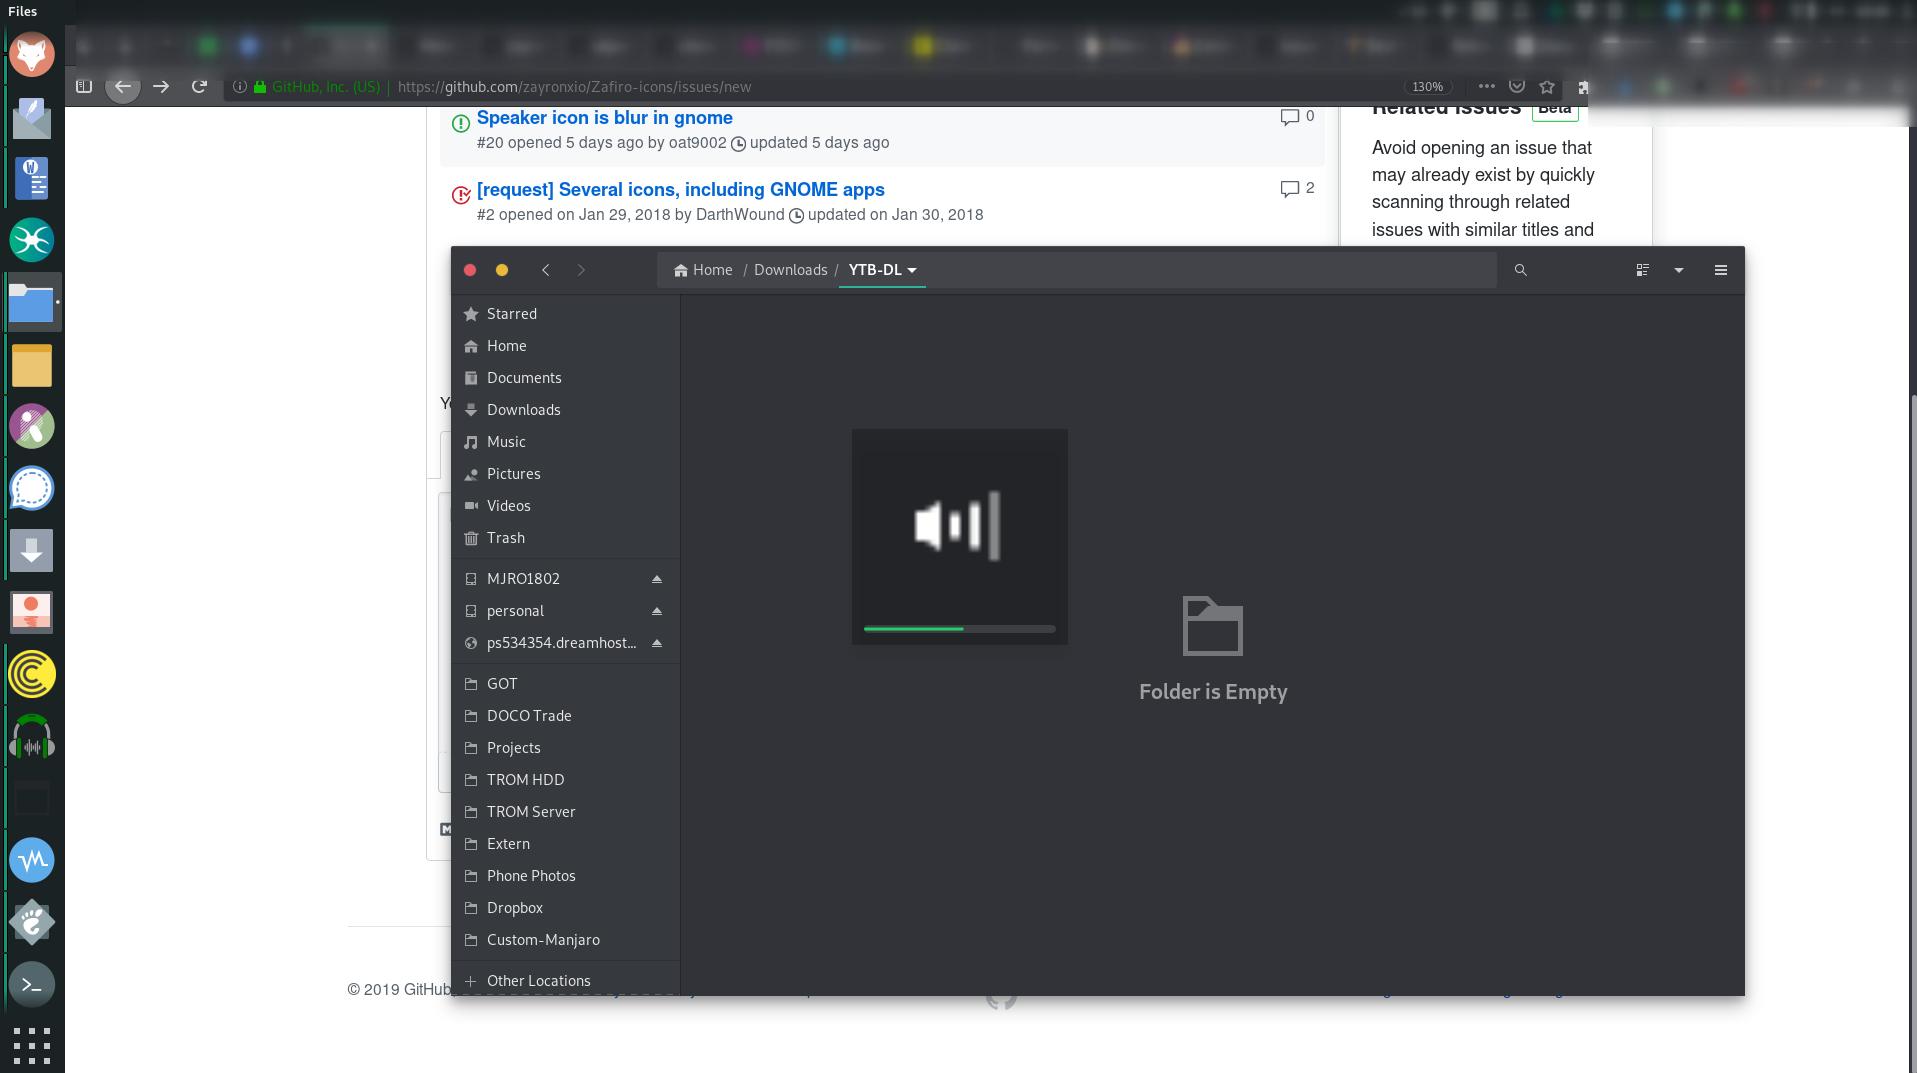 Low quality OSD icons in Gnome · Issue #22 · zayronxio/Zafiro-icons